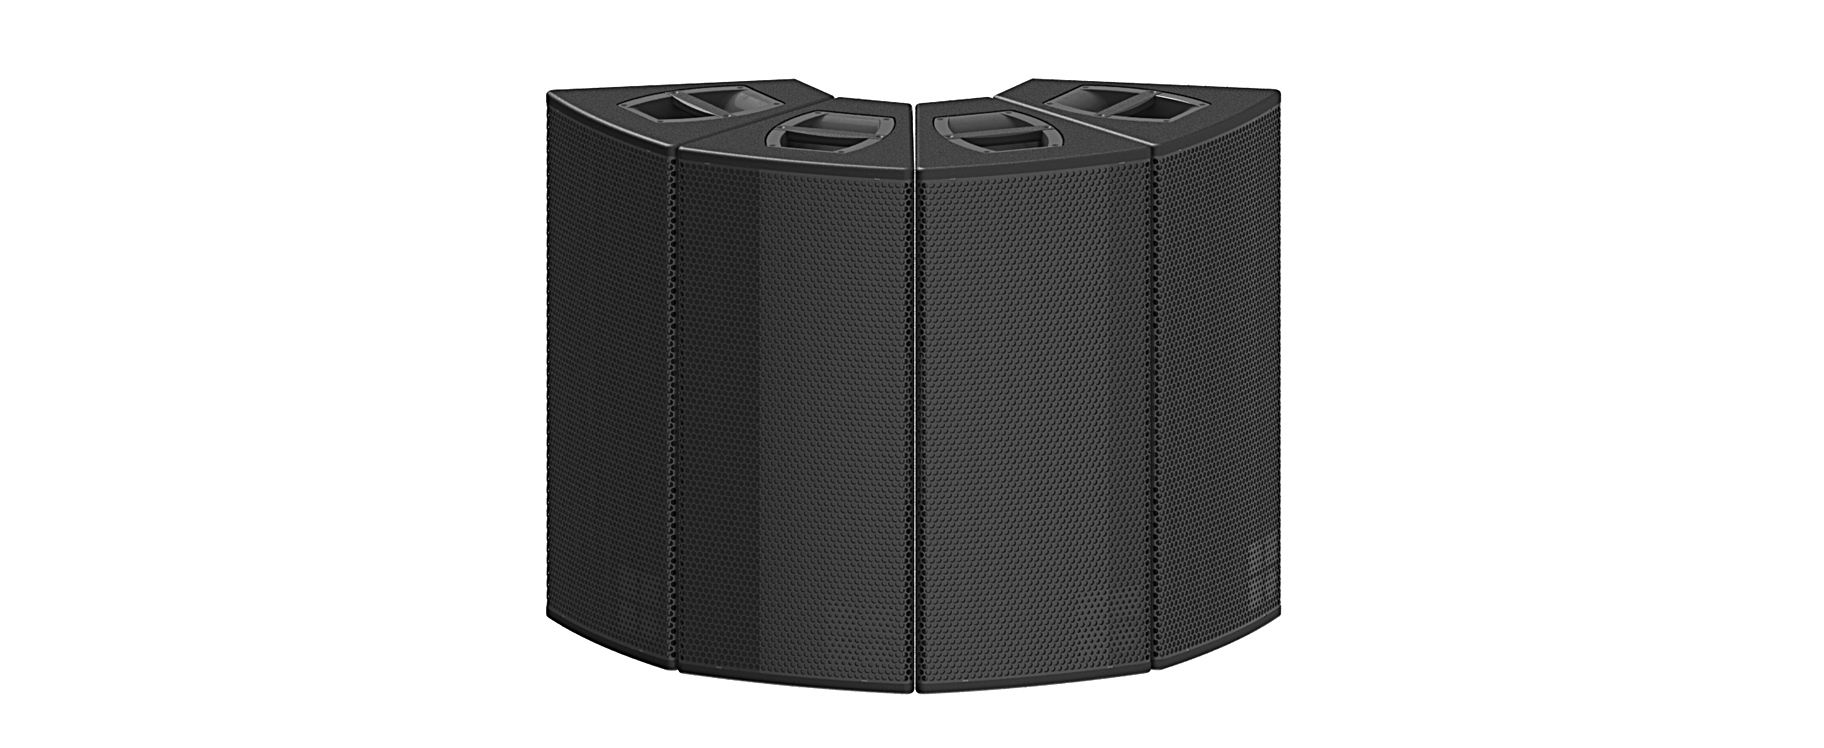 d&b audiotechnik A-Series augmented loudspeaker system